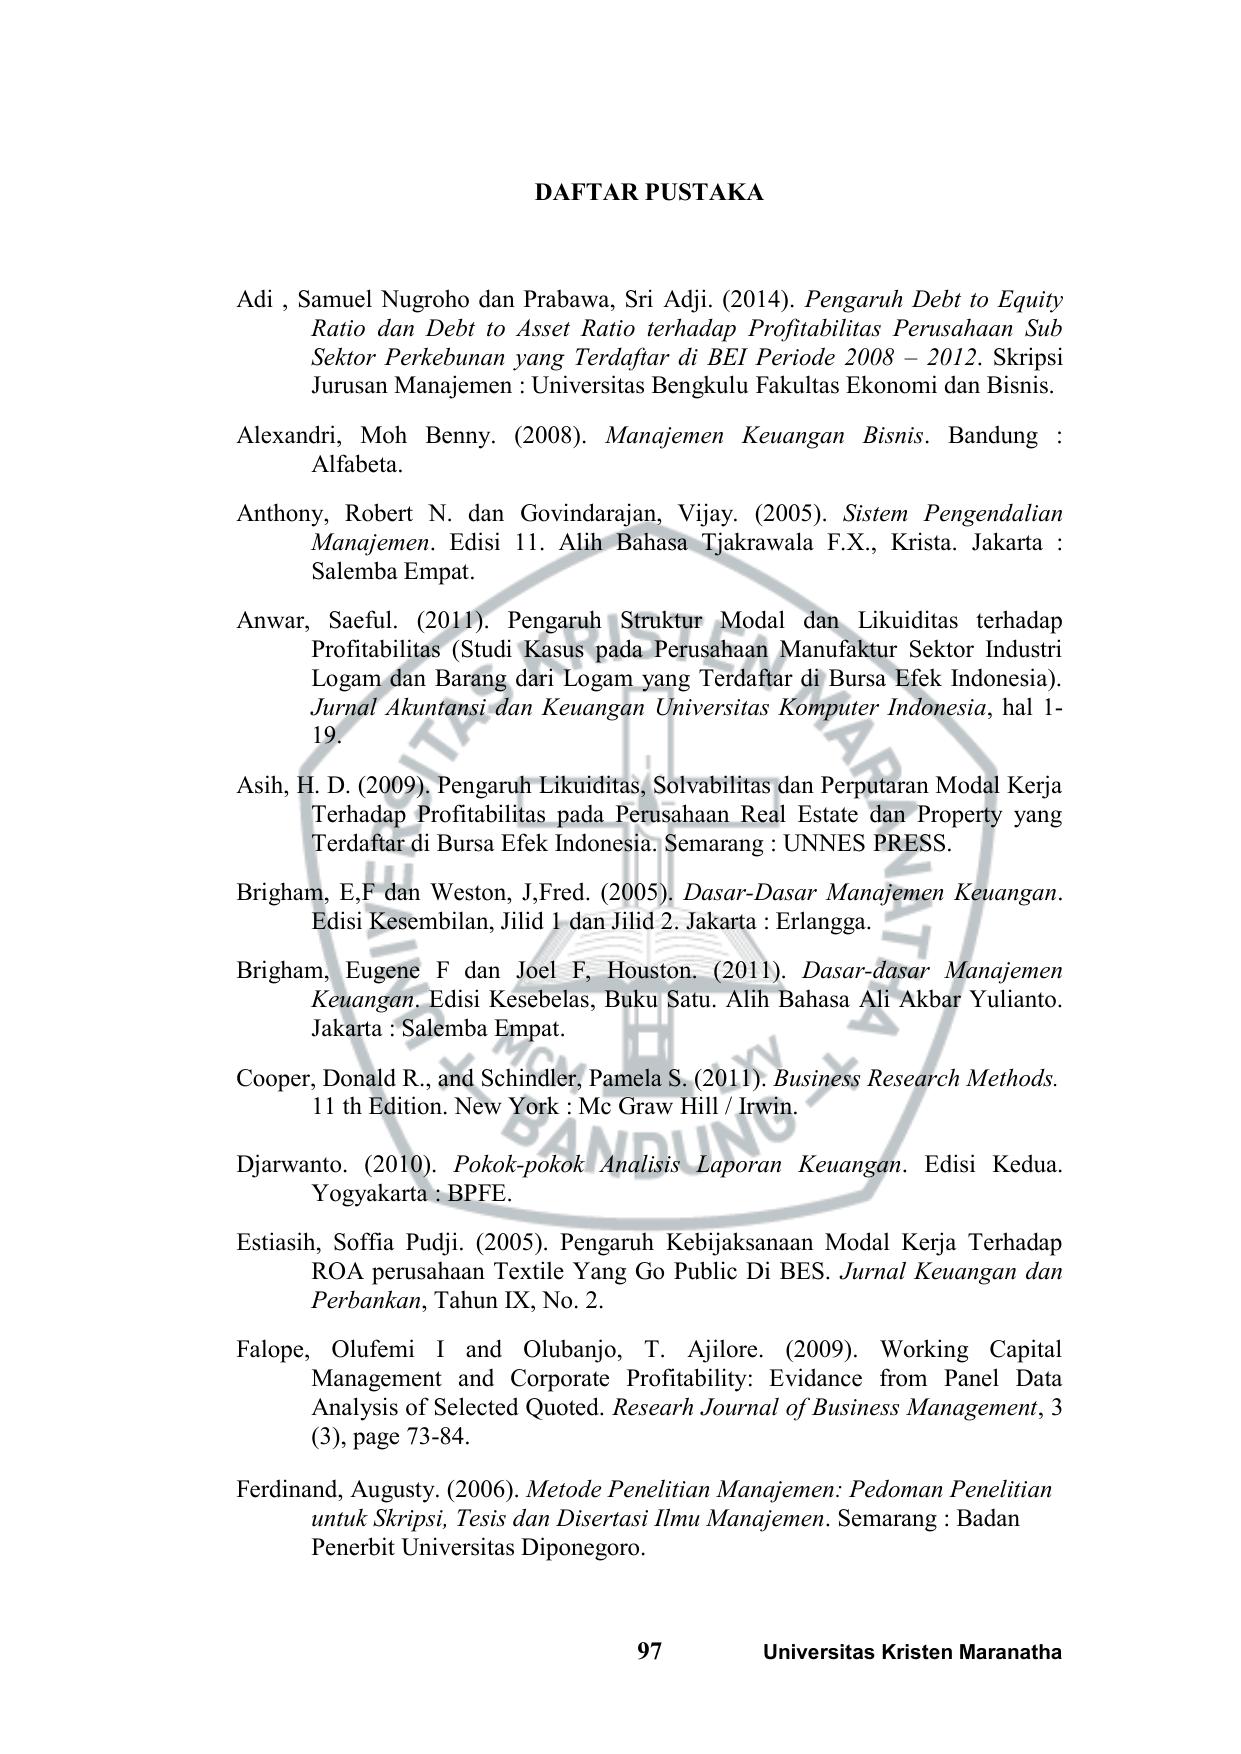 97 Daftar Pustaka Adi Samuel Nugroho Dan Prabawa Sri Adji